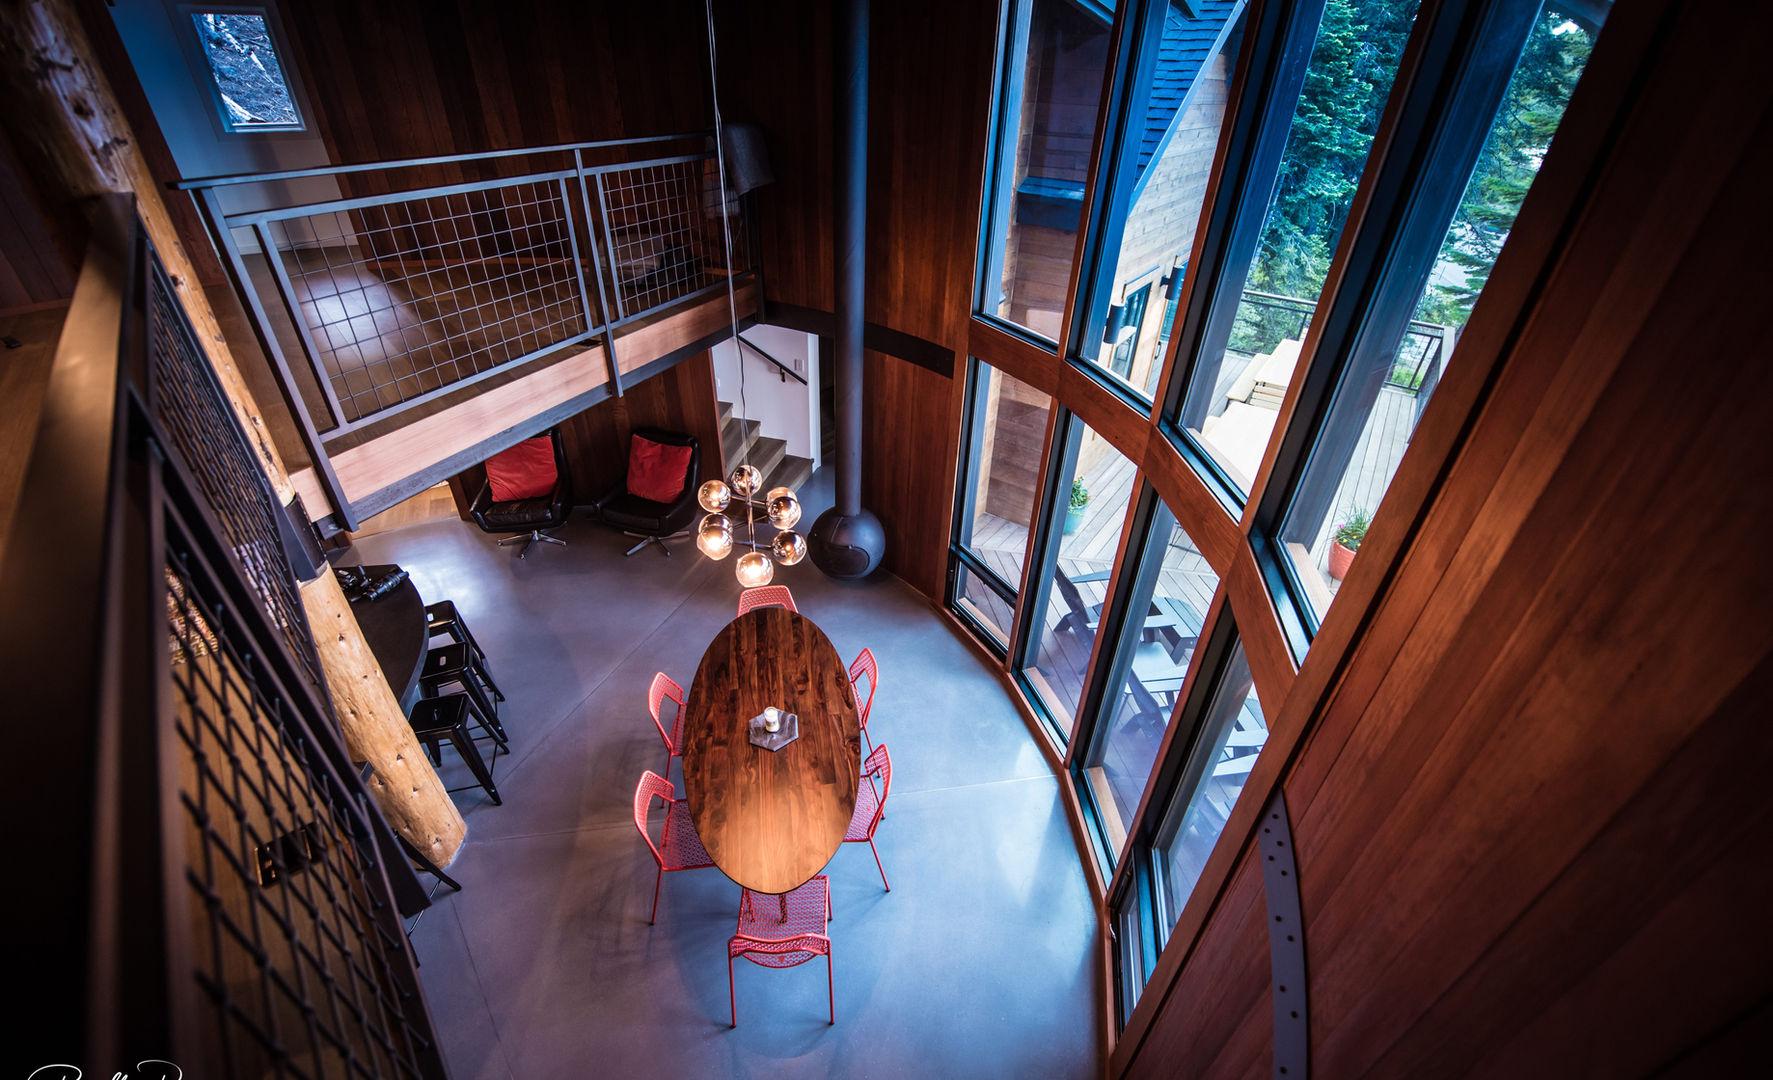 Barrel House Joanna Branzell Interior Design